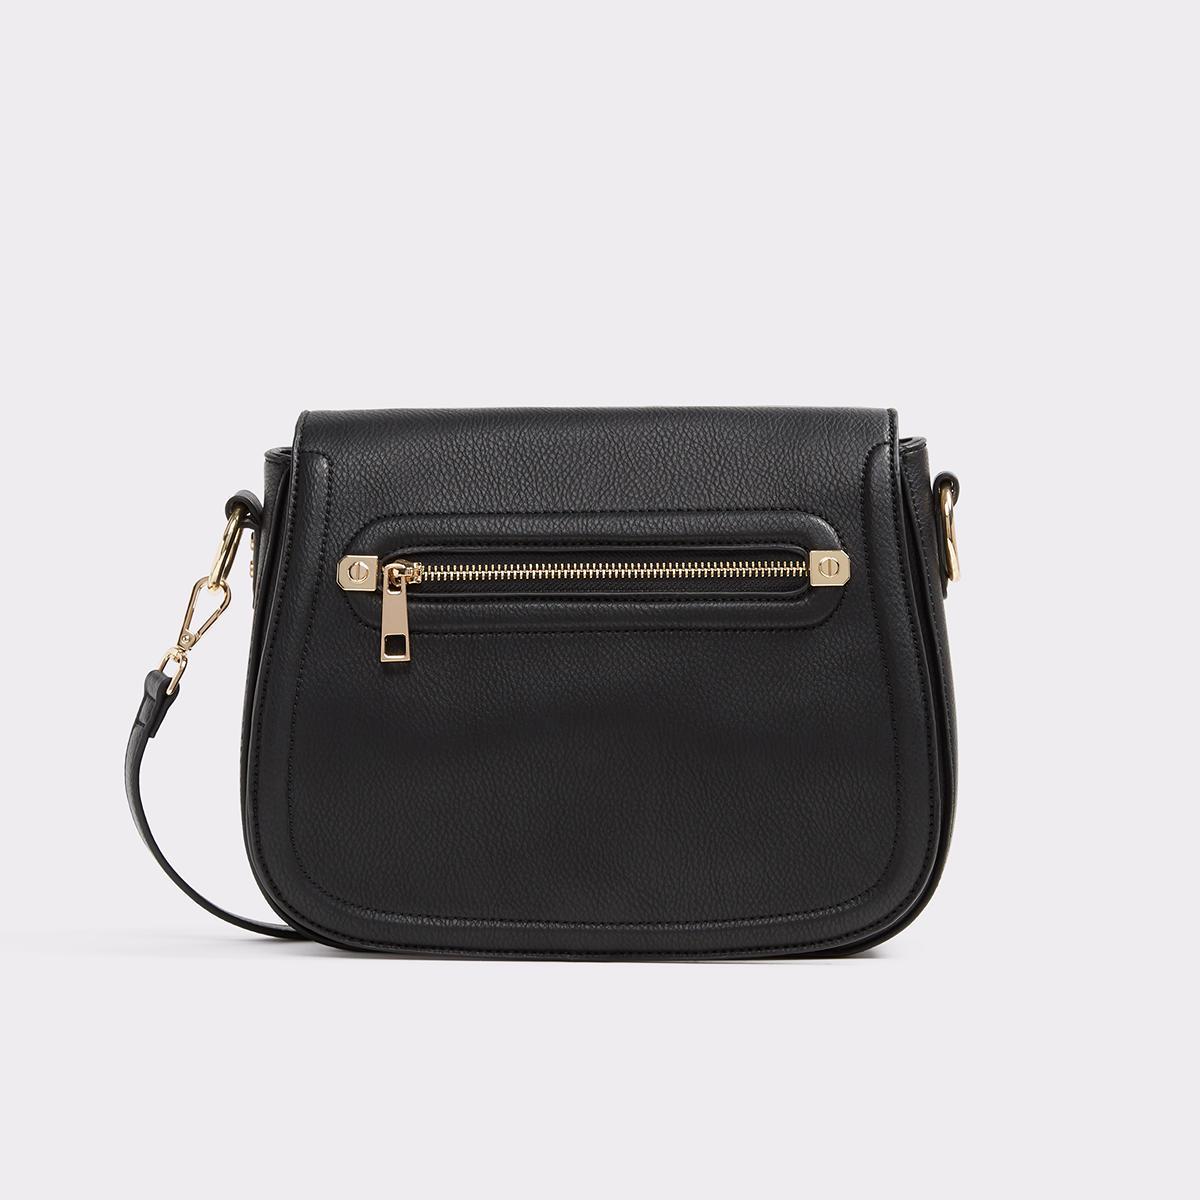 Filivia Midnight Black Women's Handbags | ALDO US at Aldo Shoes in Victor, NY | Tuggl